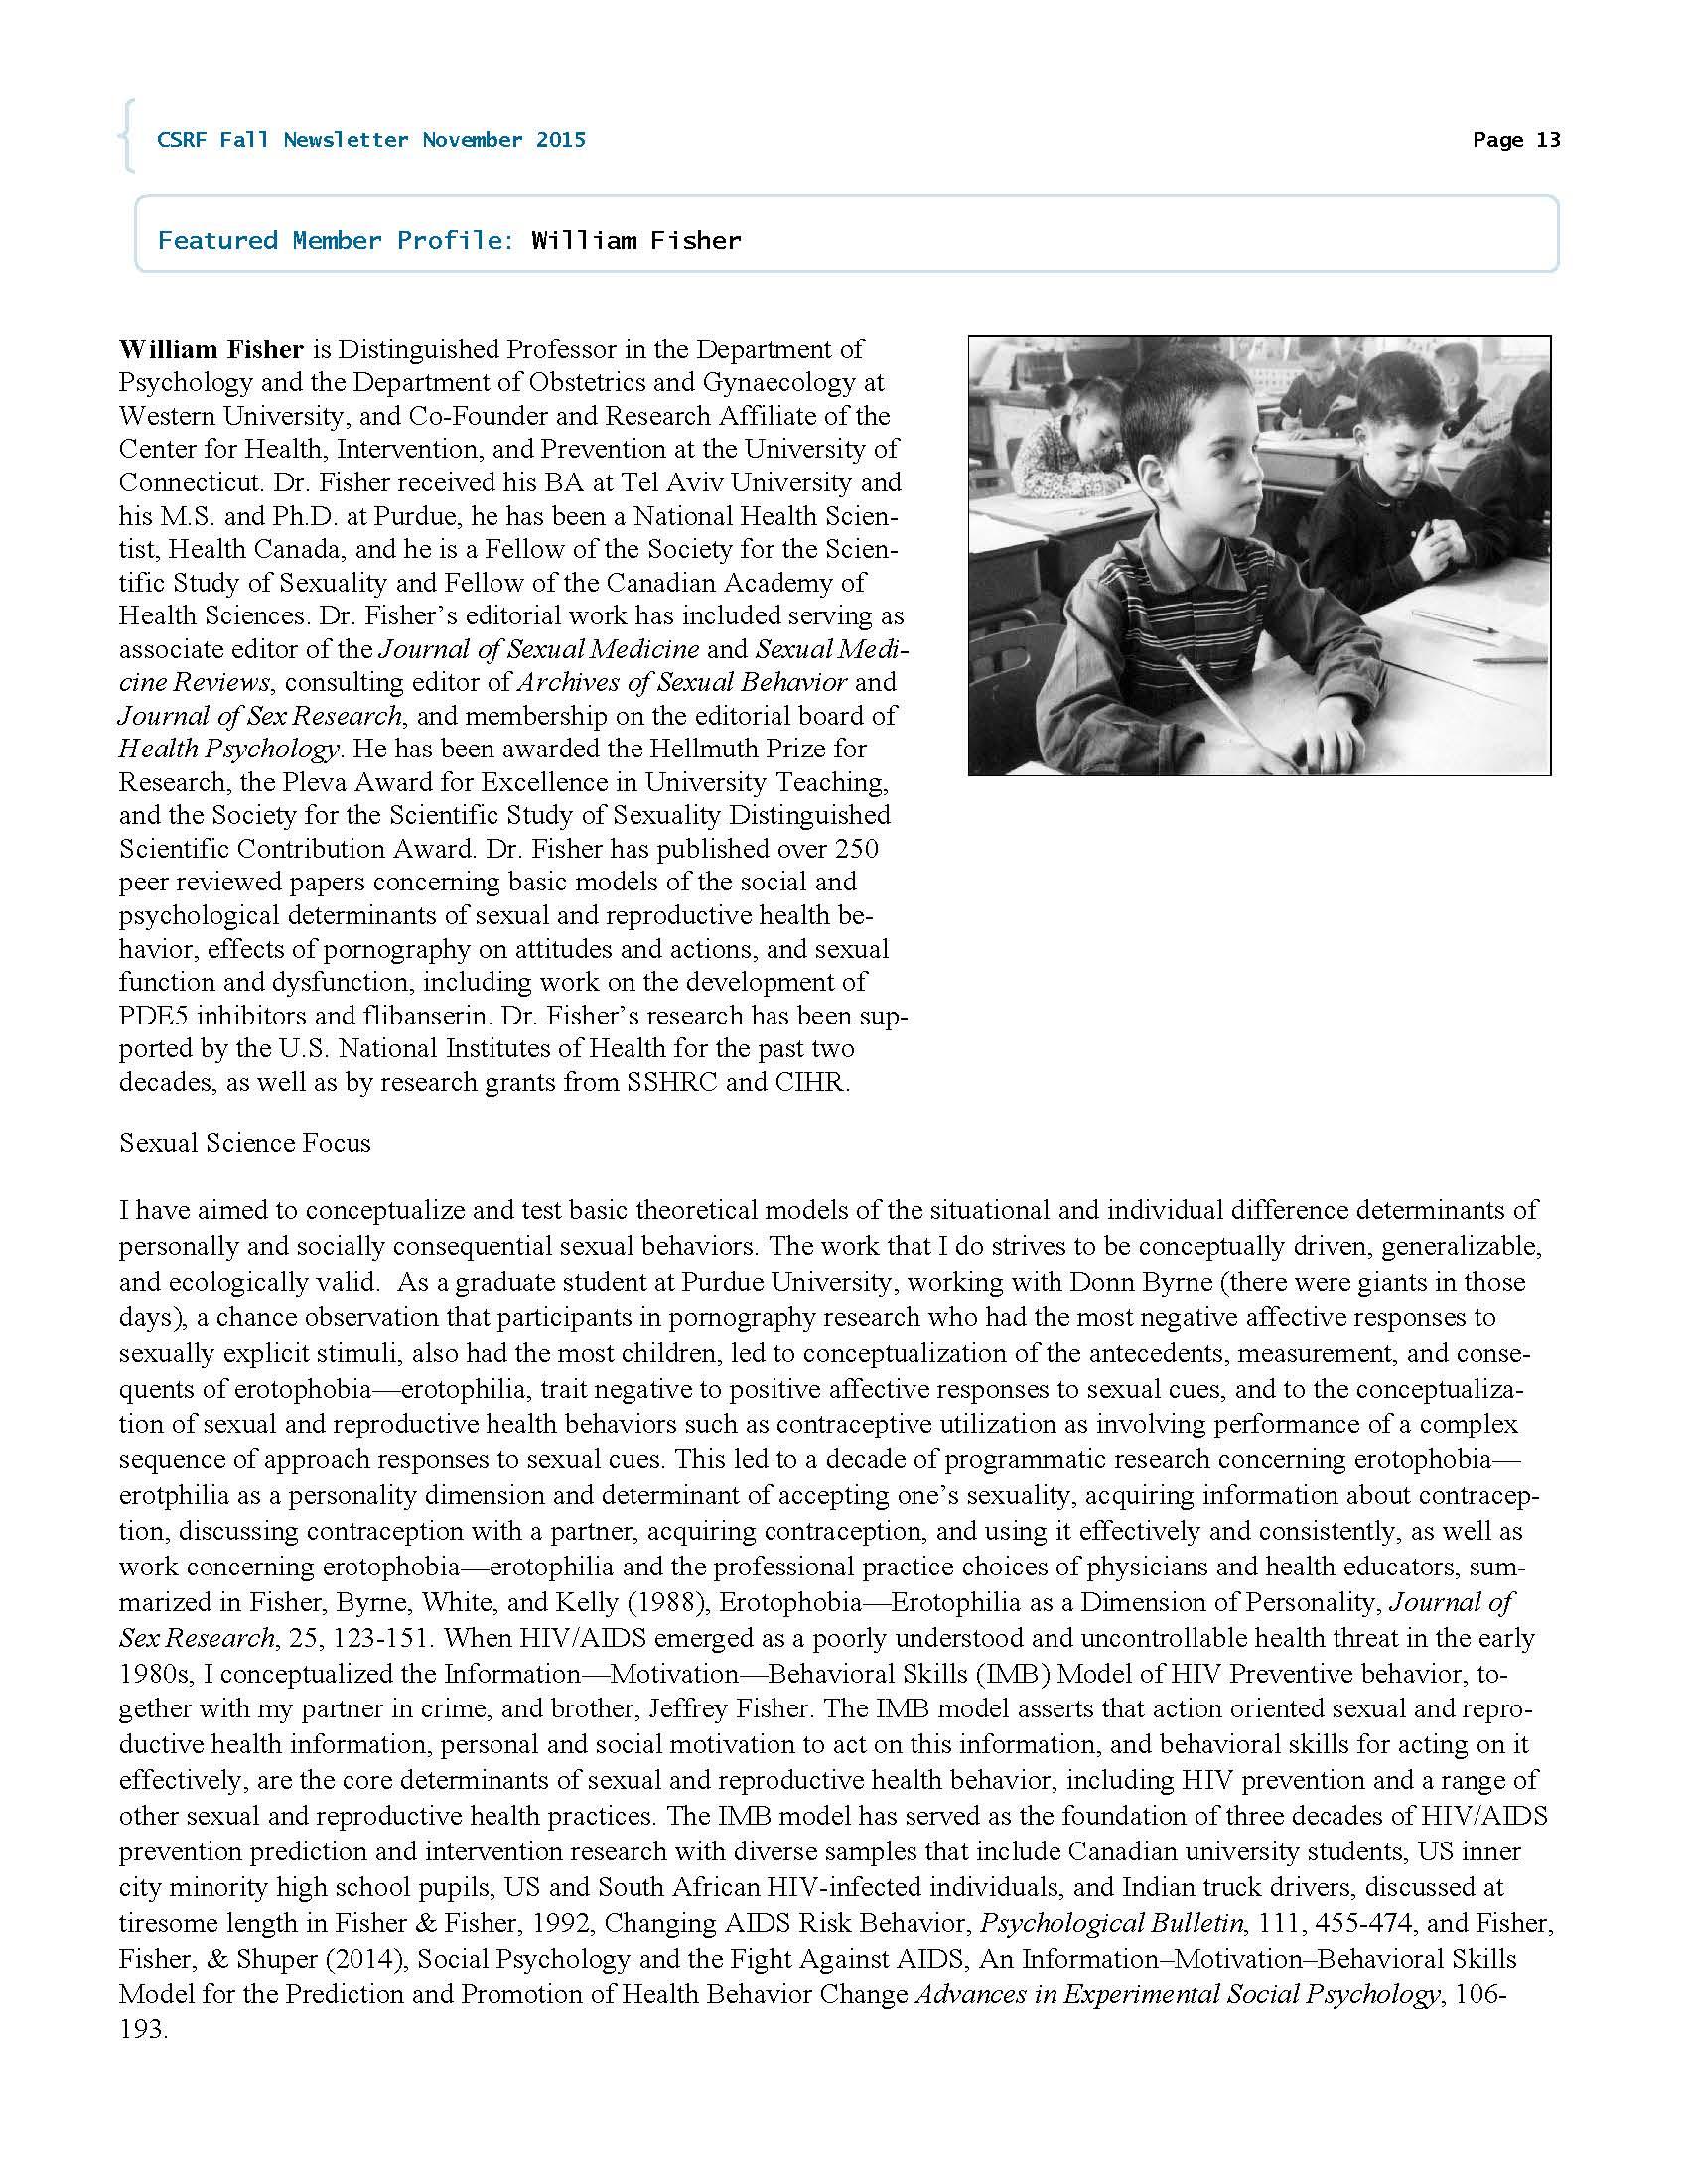 CSRF Fall Newsletter 2015_Page_13.jpg